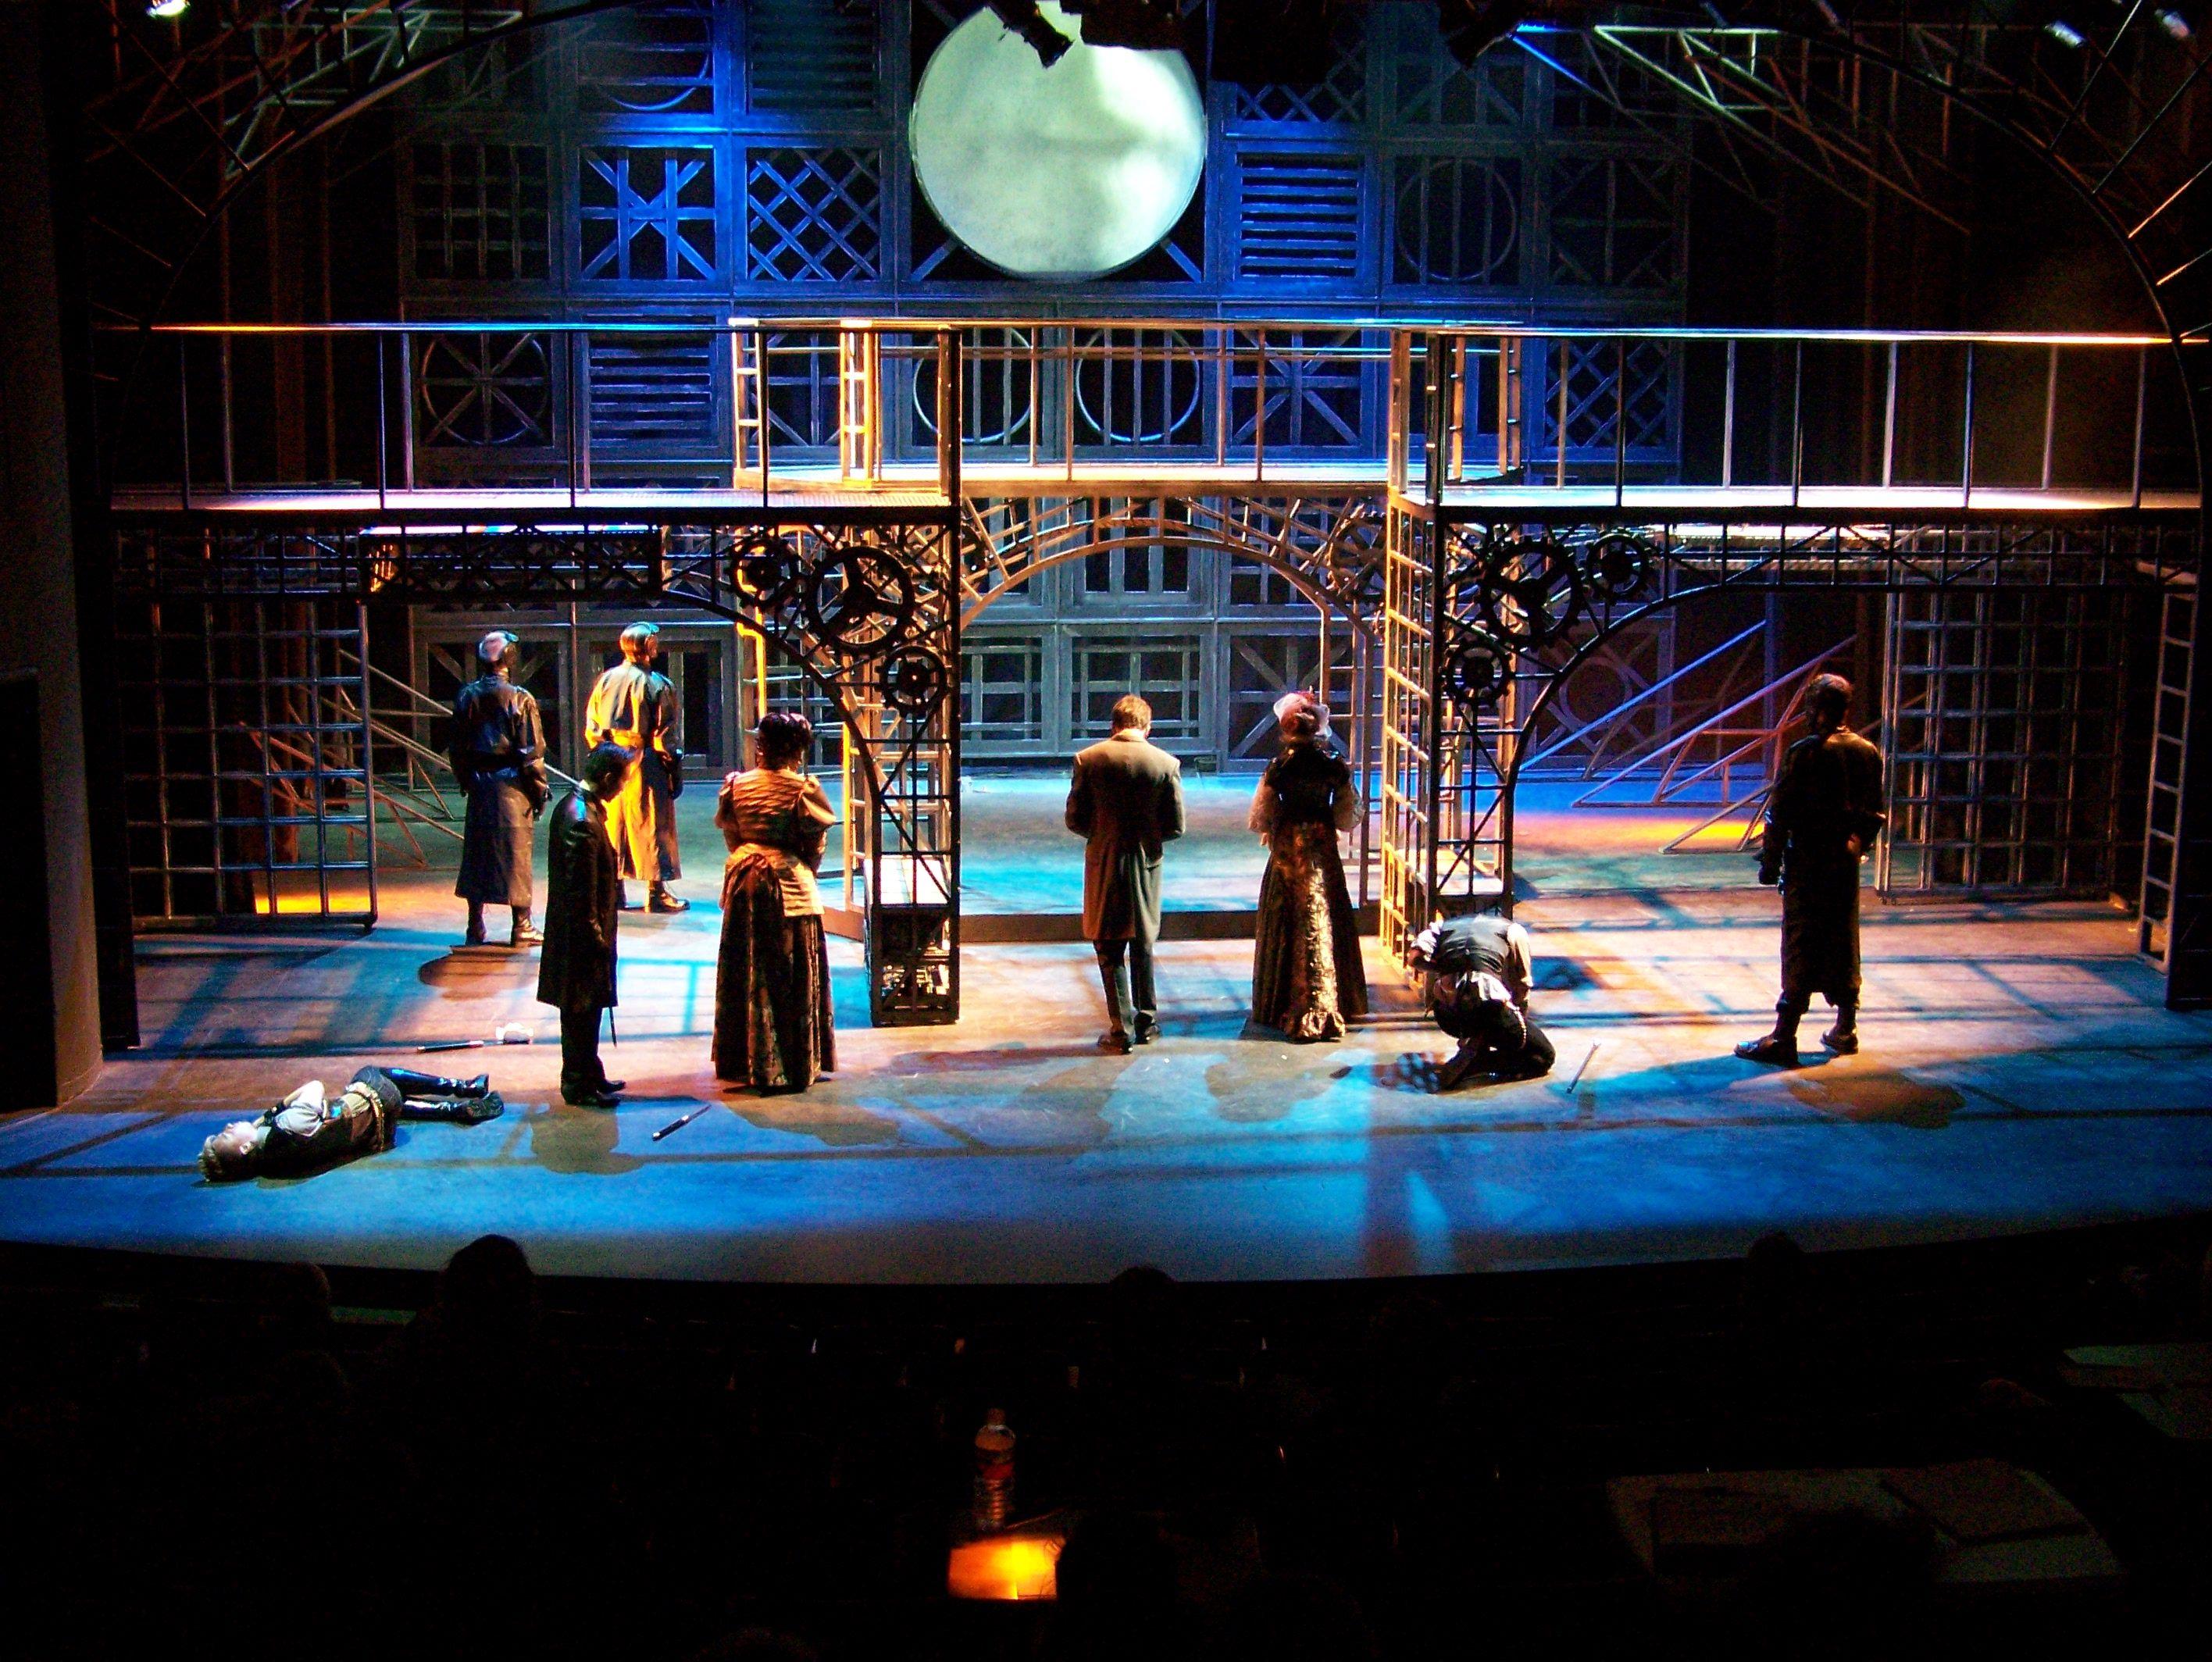 Romeo And Juliet Lighting Design By Kalliope Vlahos Stage Lighting Design Lighting Design Theatre Set Design Theatre